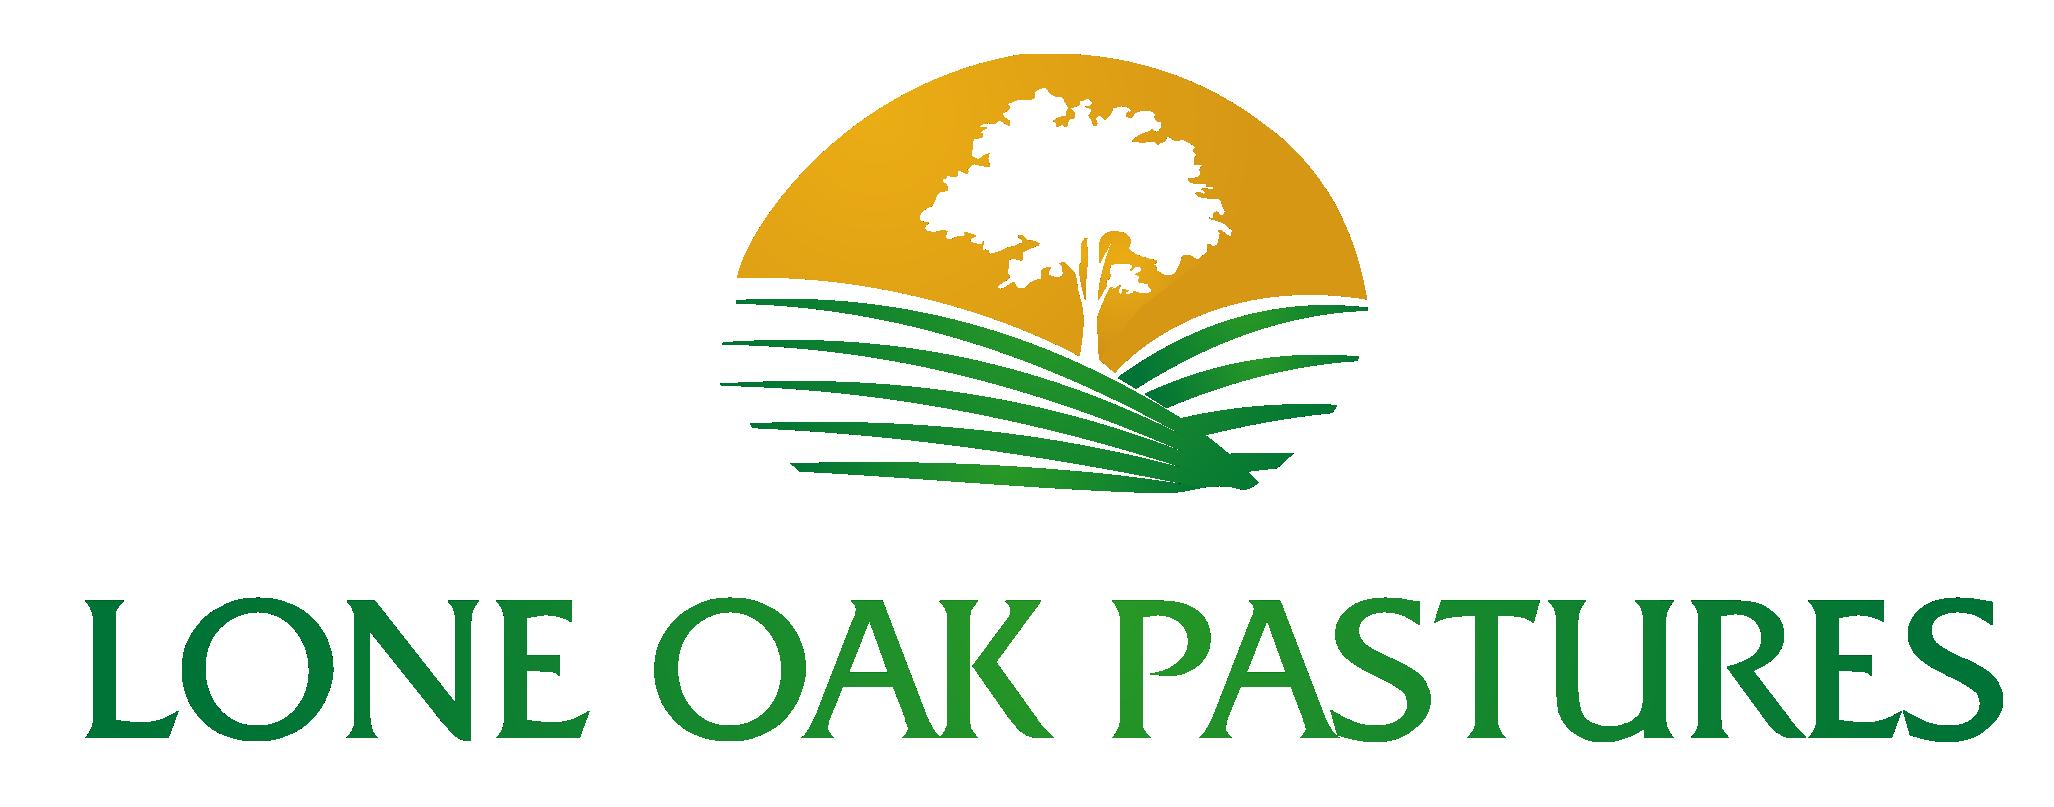 Lone Oak Pastures Logo